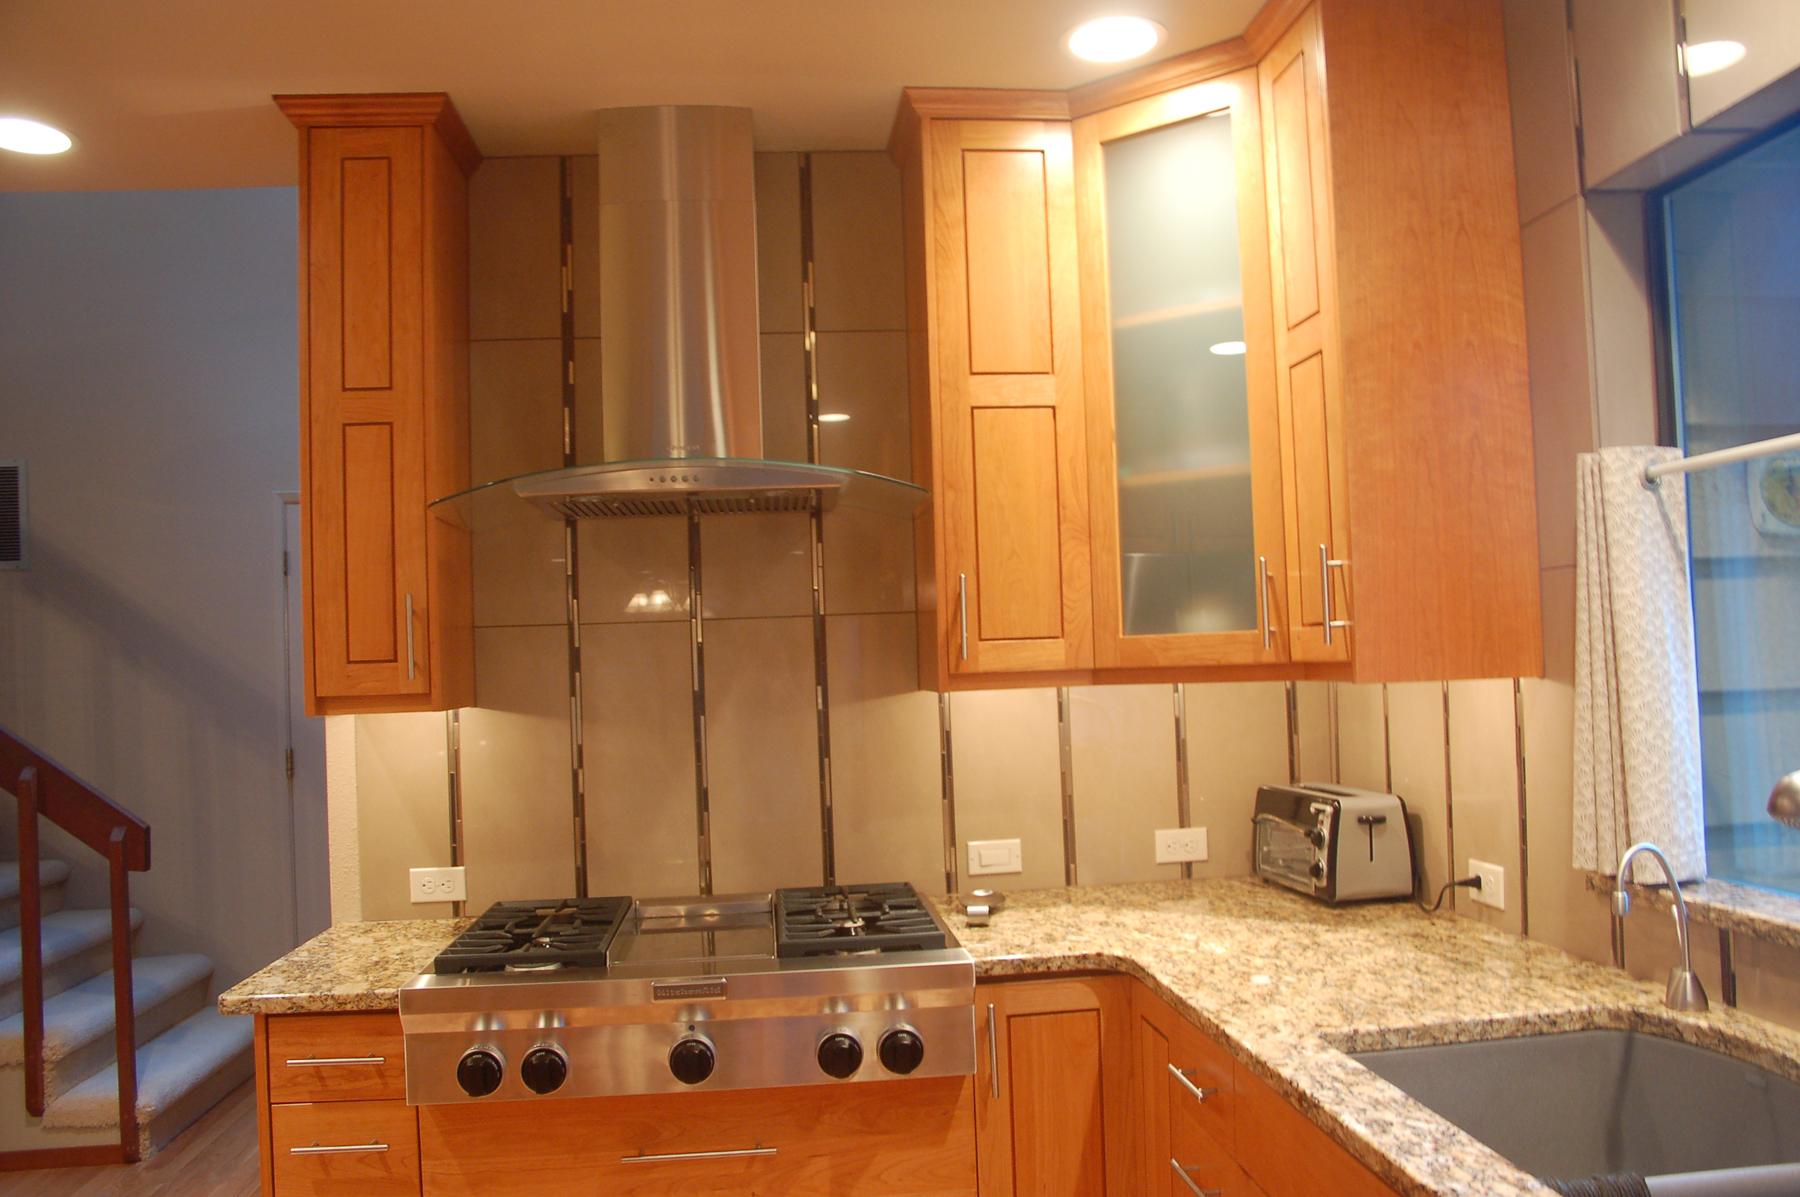 Cabinets Backsplash And Counter